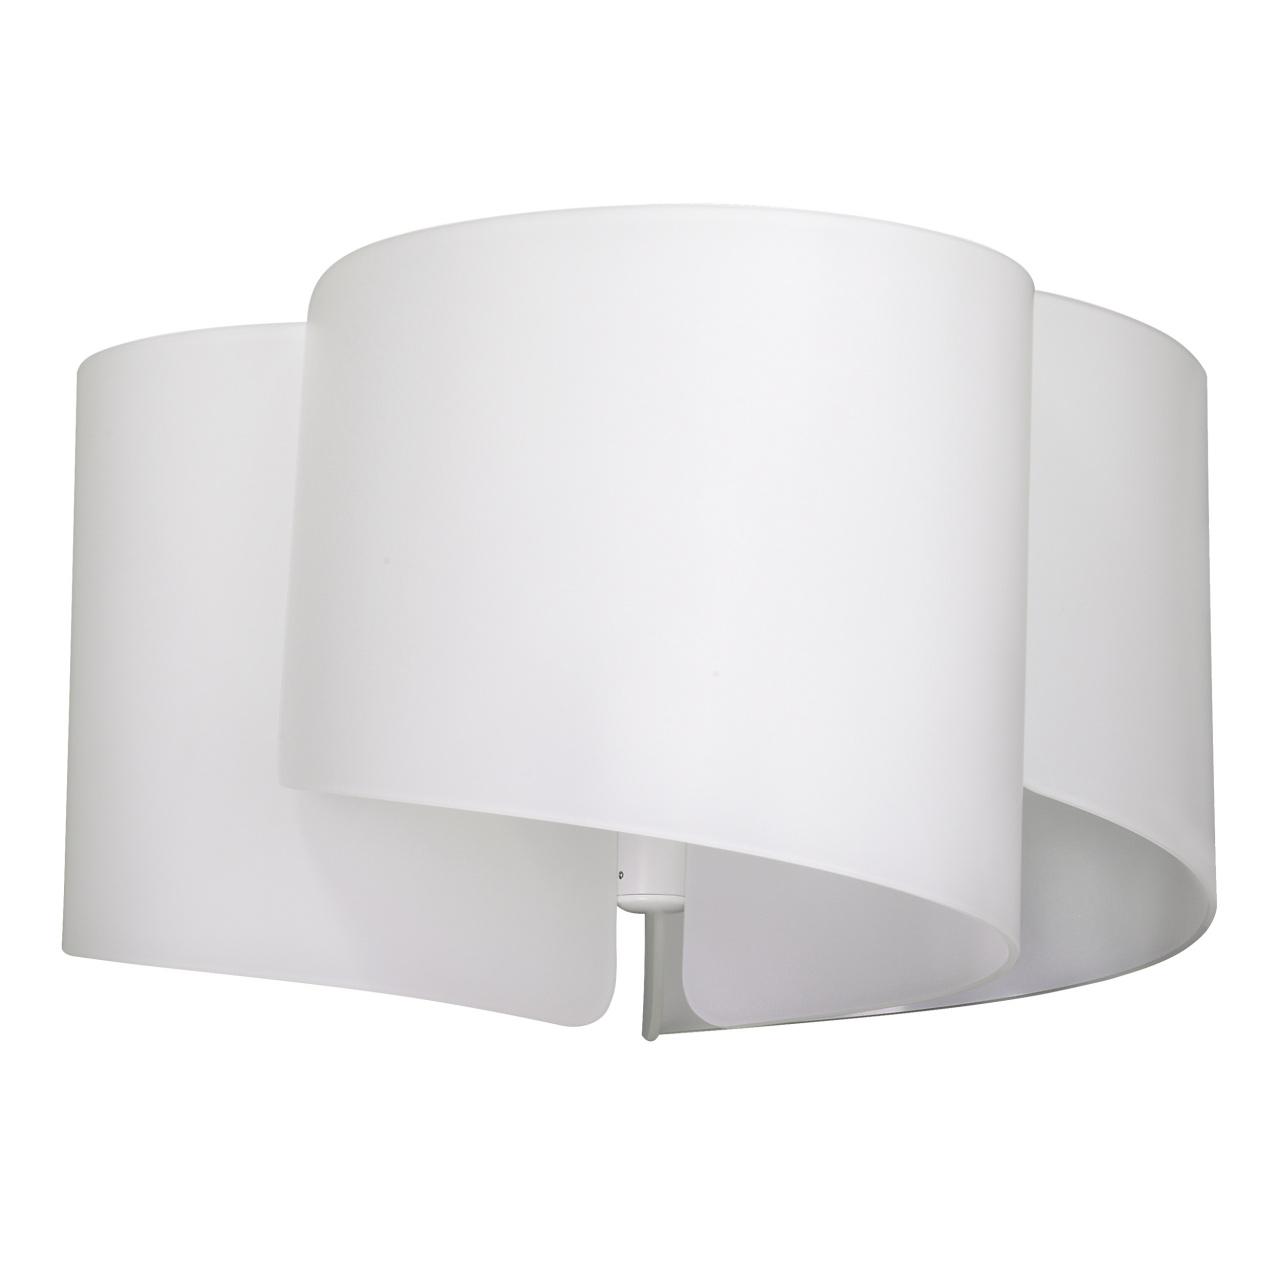 Люстра потолочная Pittore 3х40W E27 белый Lightstar 811030